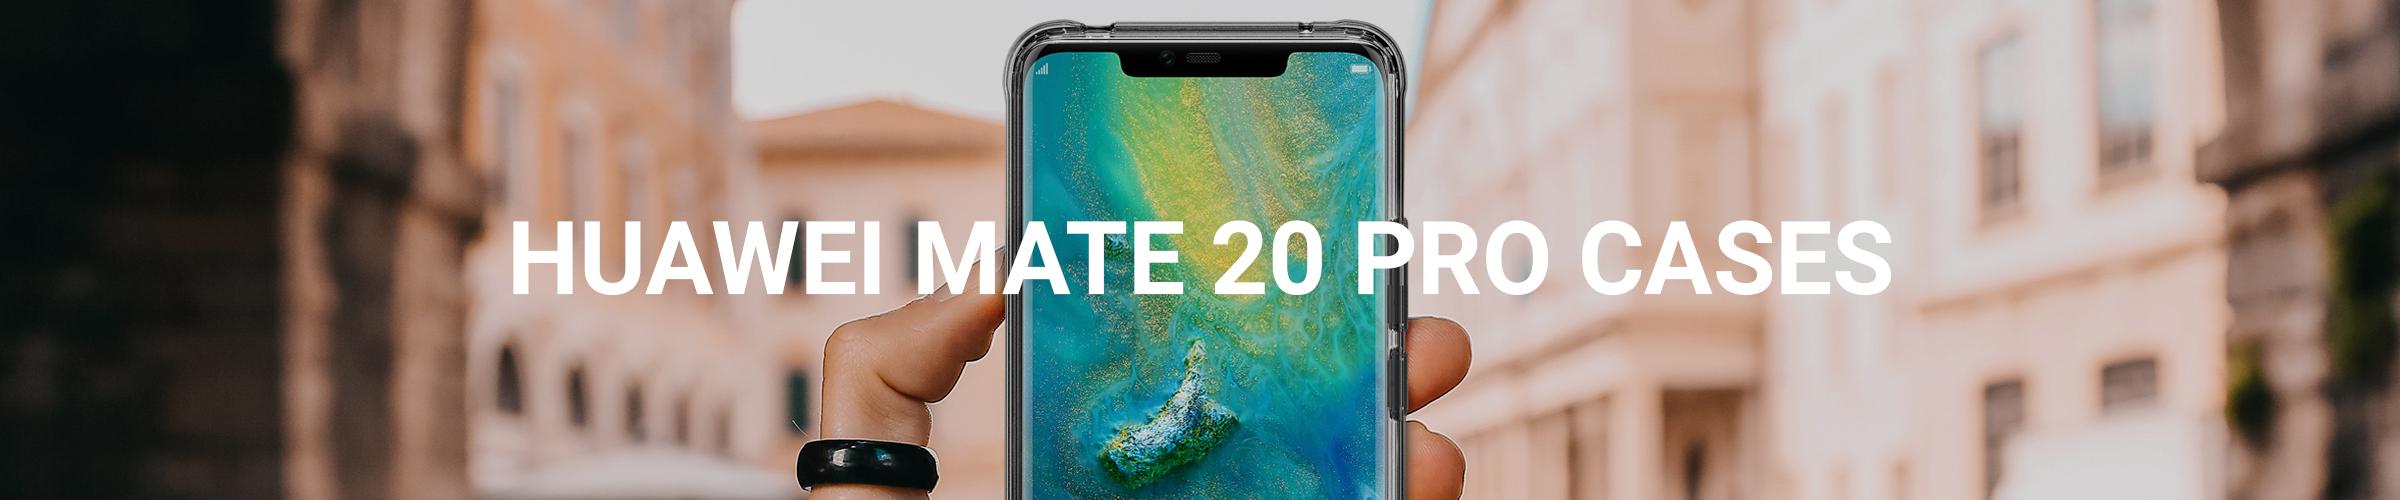 Huawei Mate 20 Pro bolsas